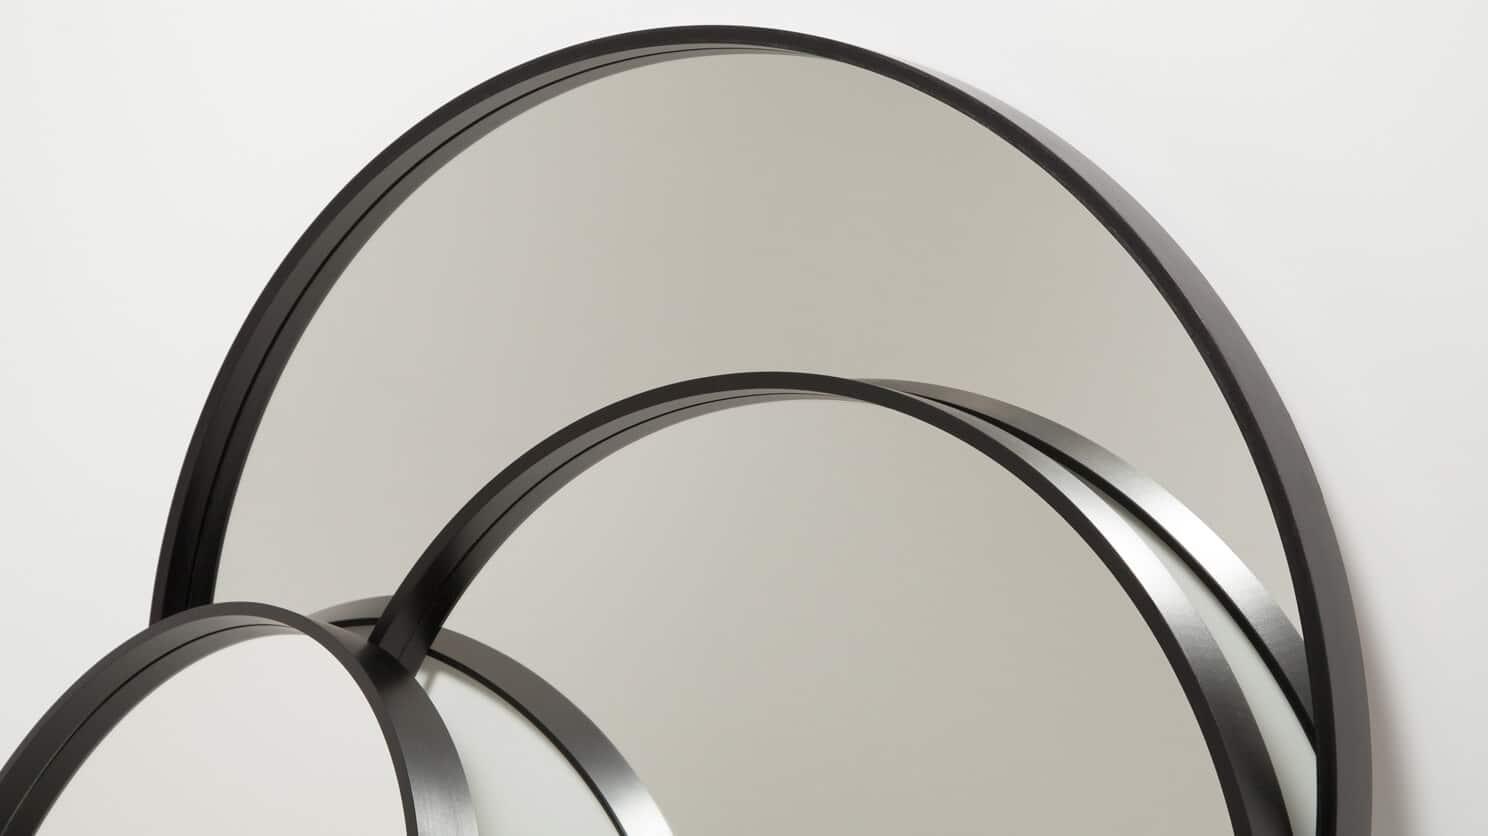 3130 043 par 8 mirrors conner mirror black detail 01